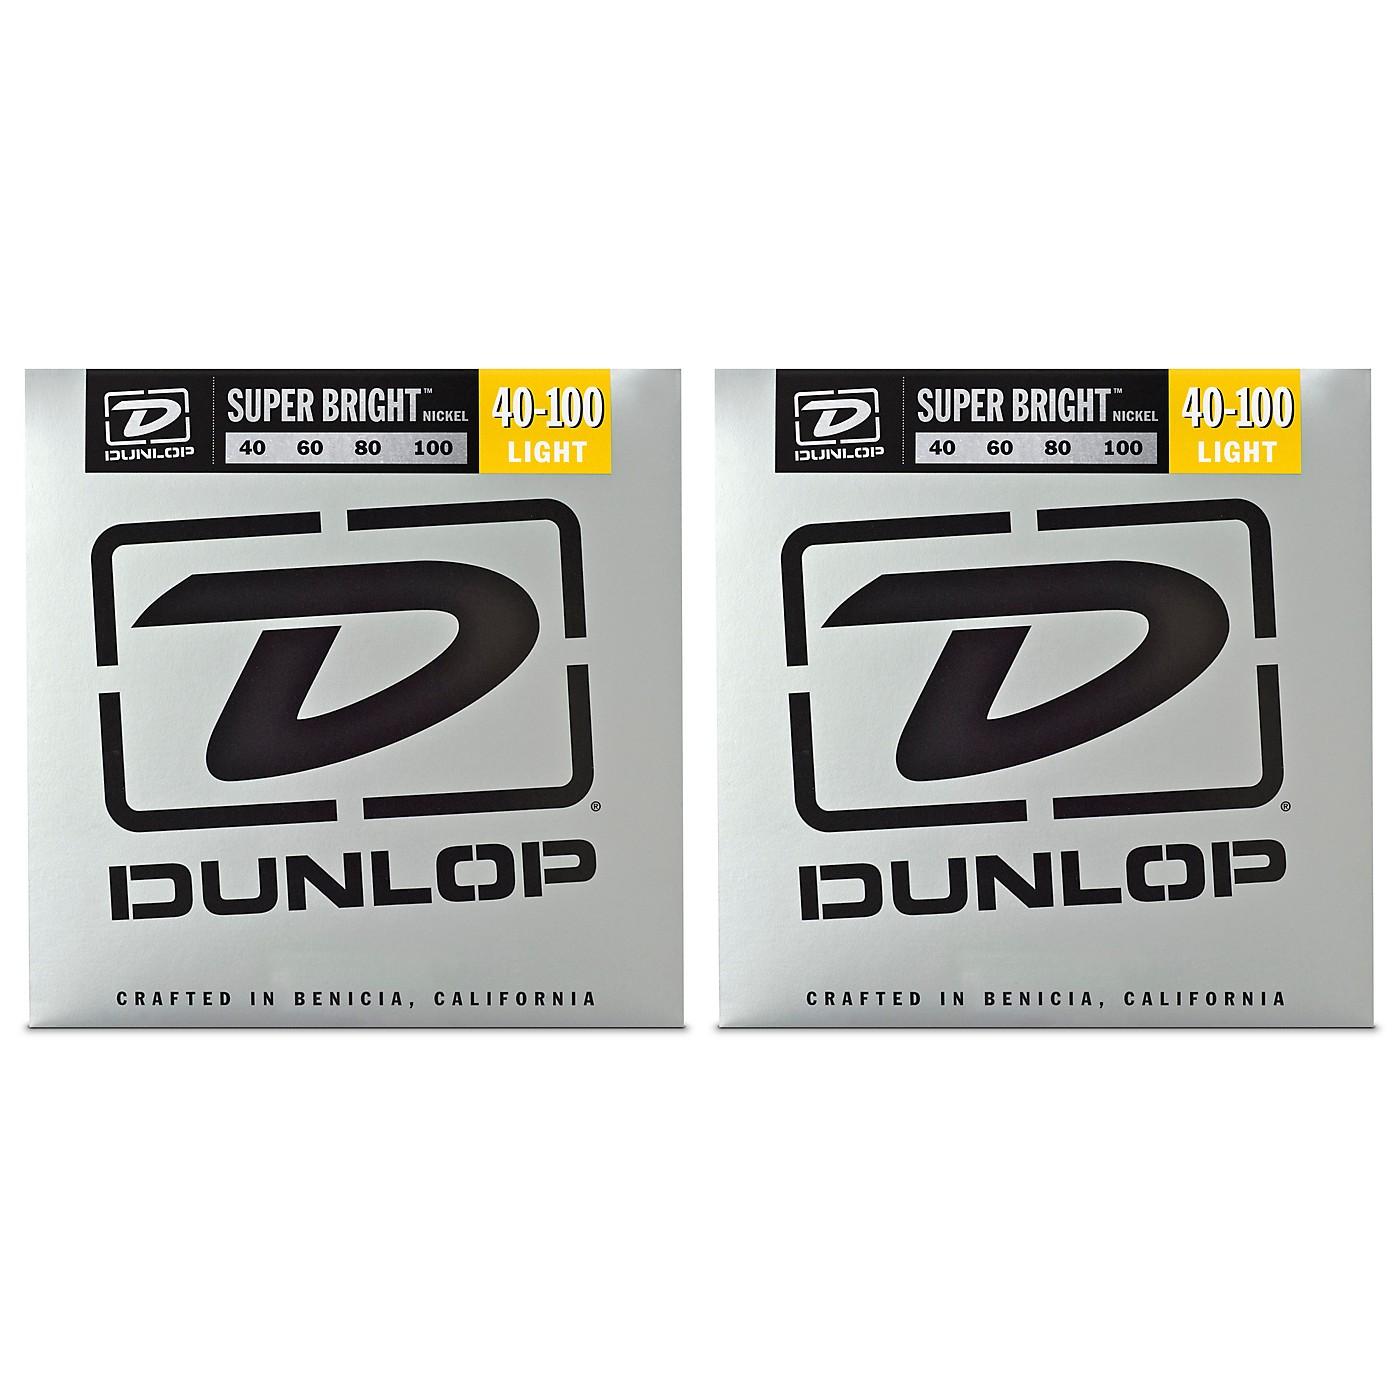 Dunlop Super Bright Nickel Light 4-String Bass Guitar Strings (40-100) 2-Pack thumbnail